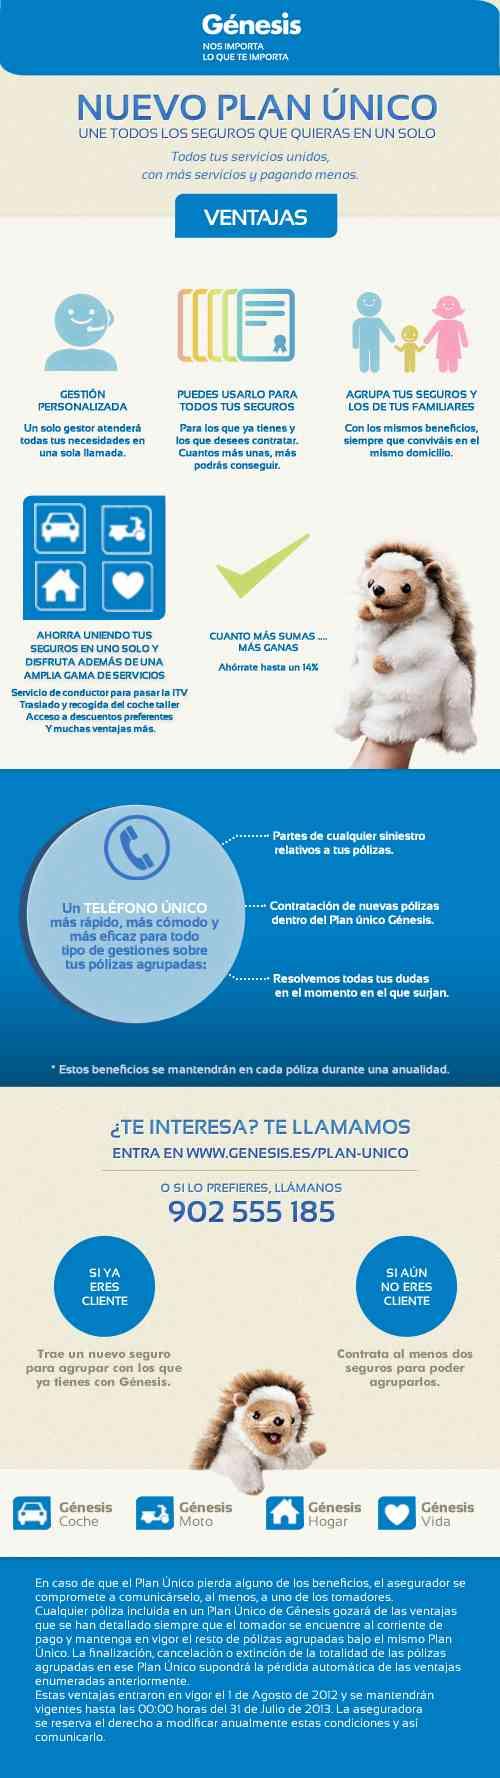 infografia genesis plan unico